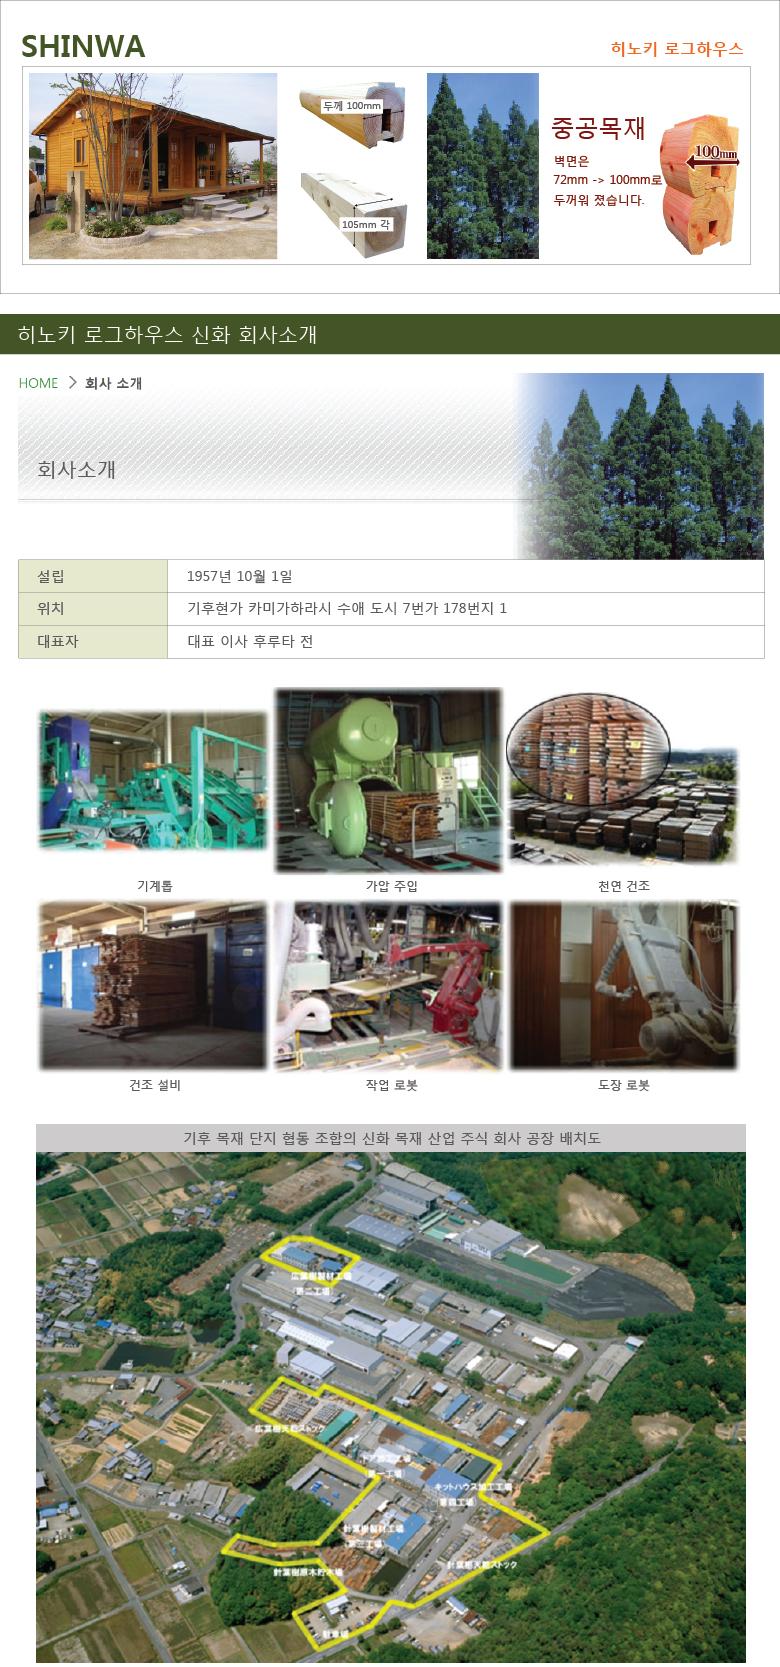 SHINWA_히노끼-하우스-신화목재공업_1.jpg